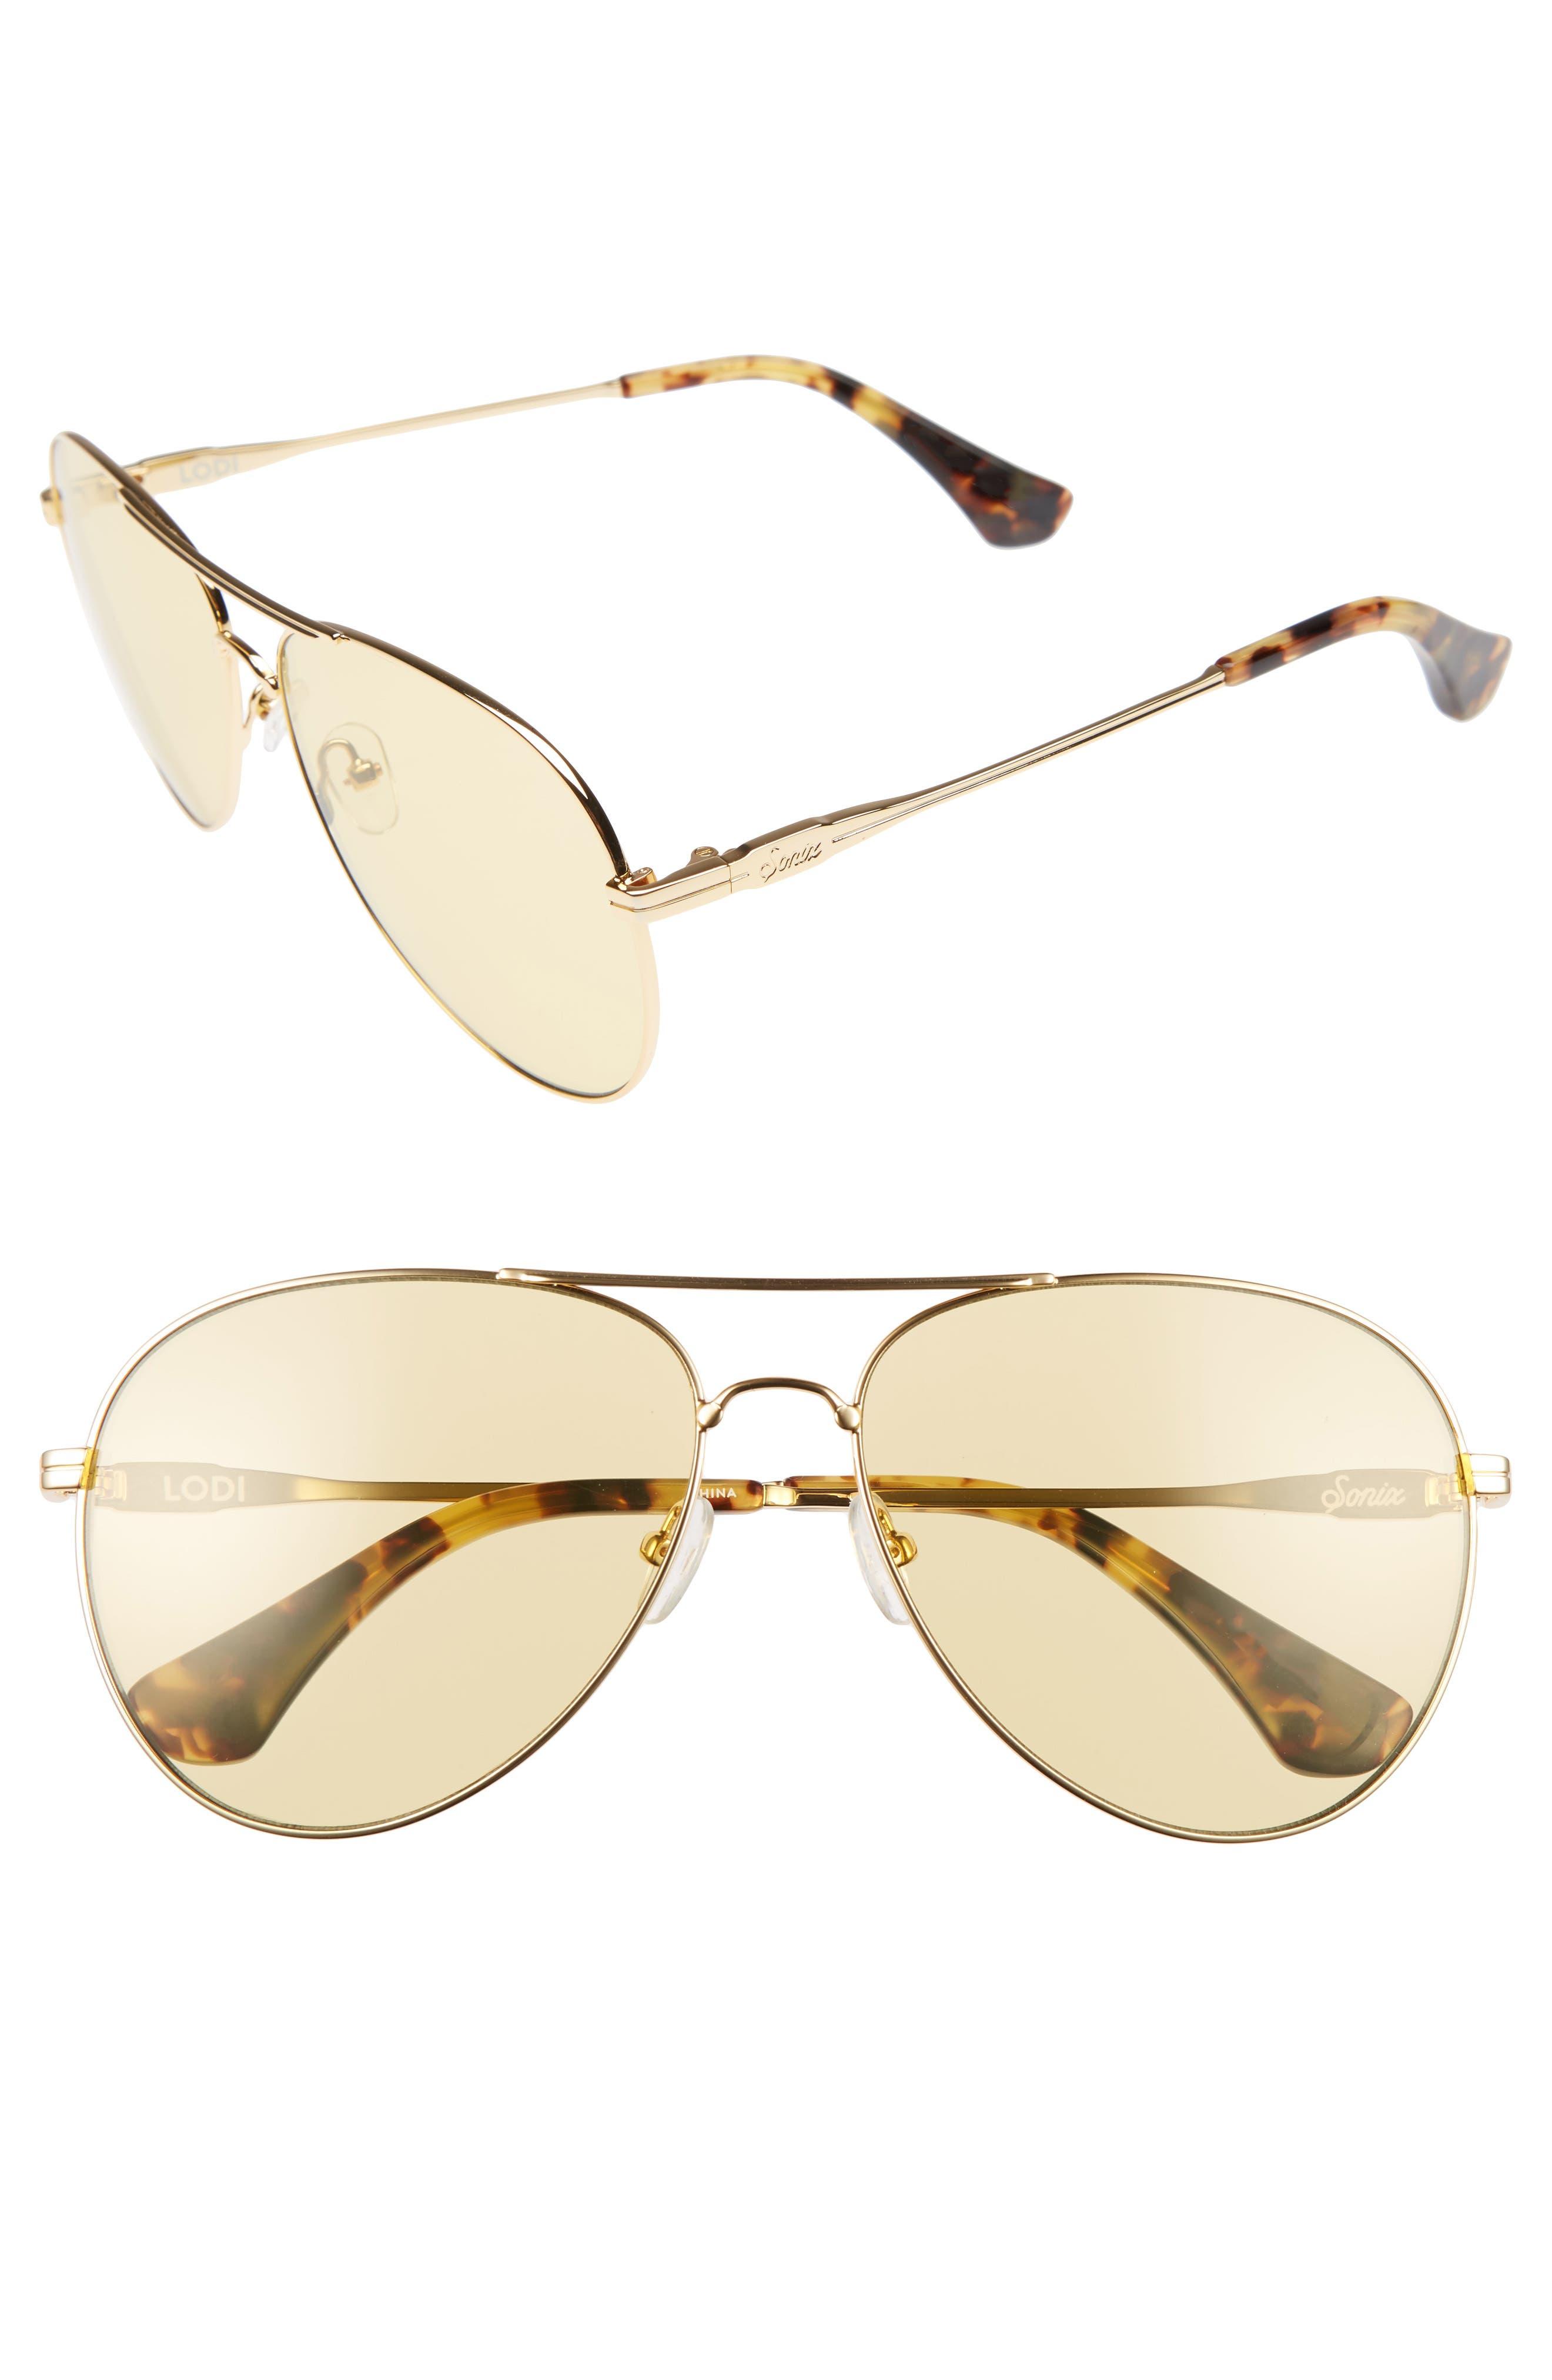 Lodi 62mm Mirrored Aviator Sunglasses,                             Alternate thumbnail 9, color,